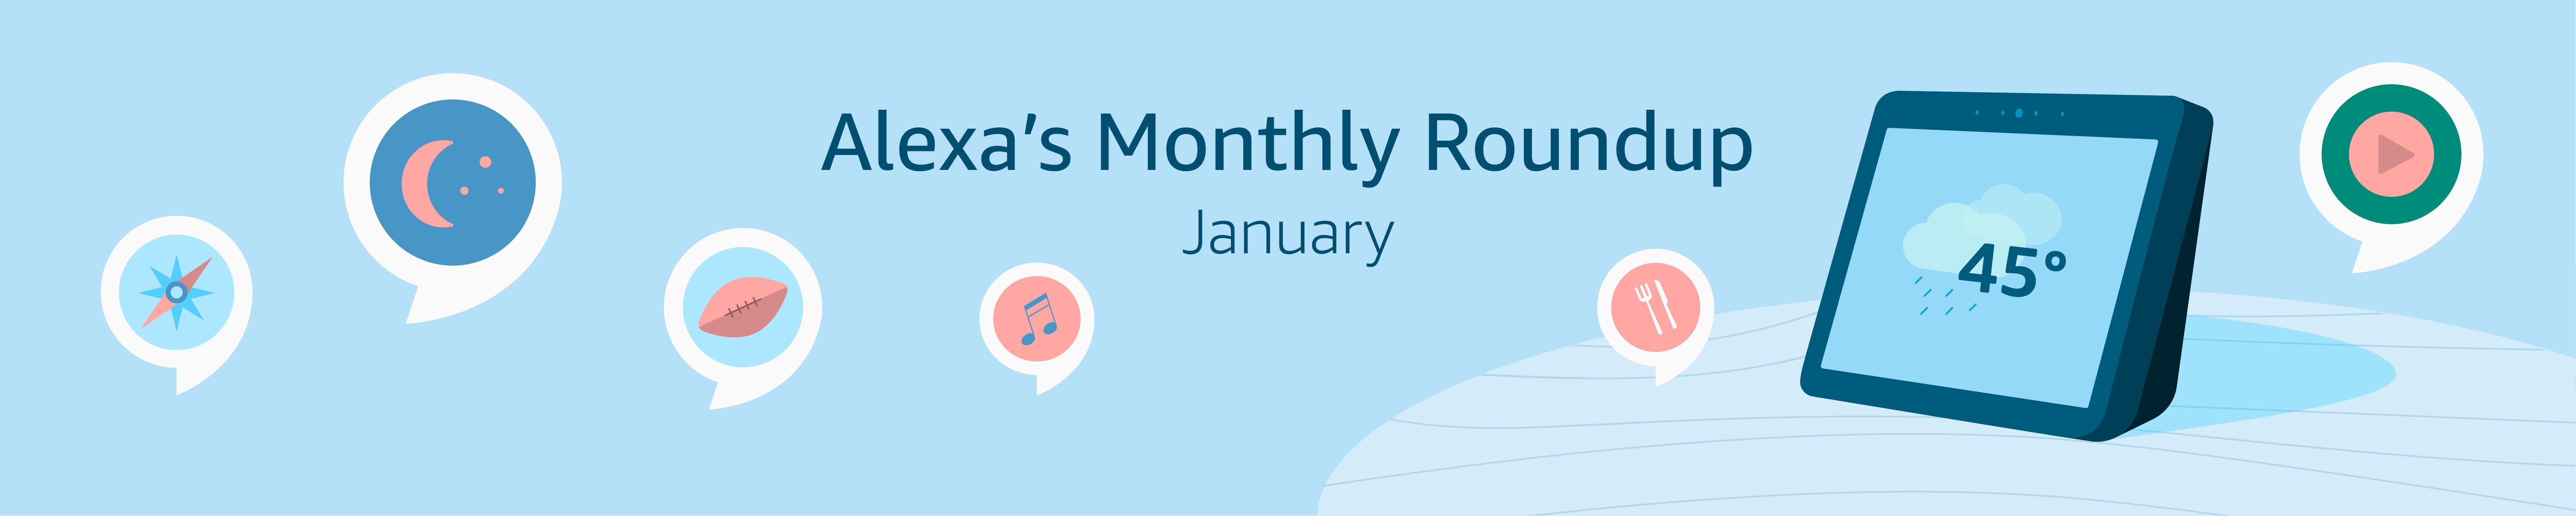 Alexa's Monthly Roundup: January